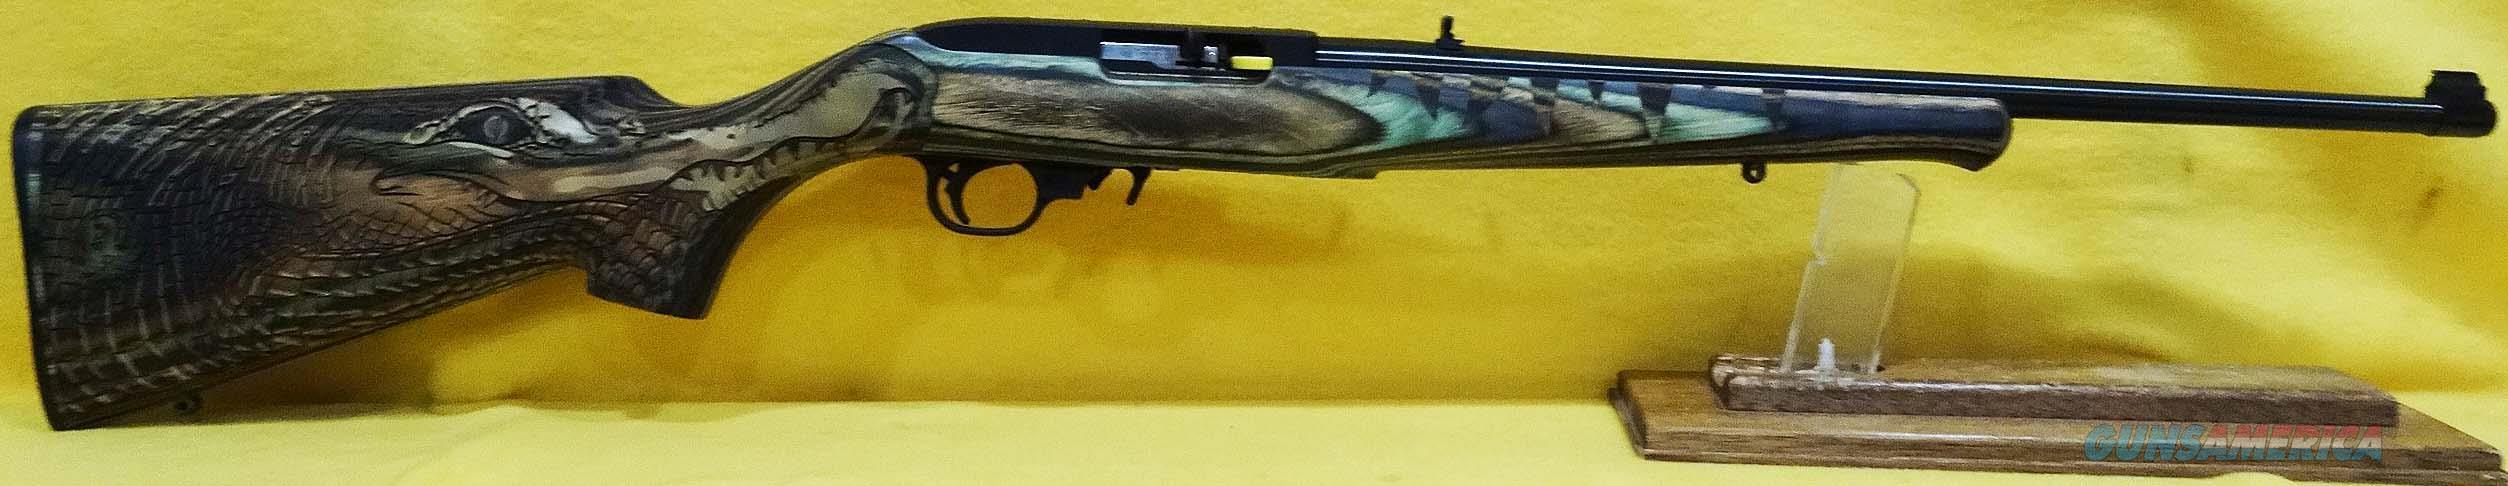 RUGER 10/22 GATOR  Guns > Rifles > Ruger Rifles > 10-22